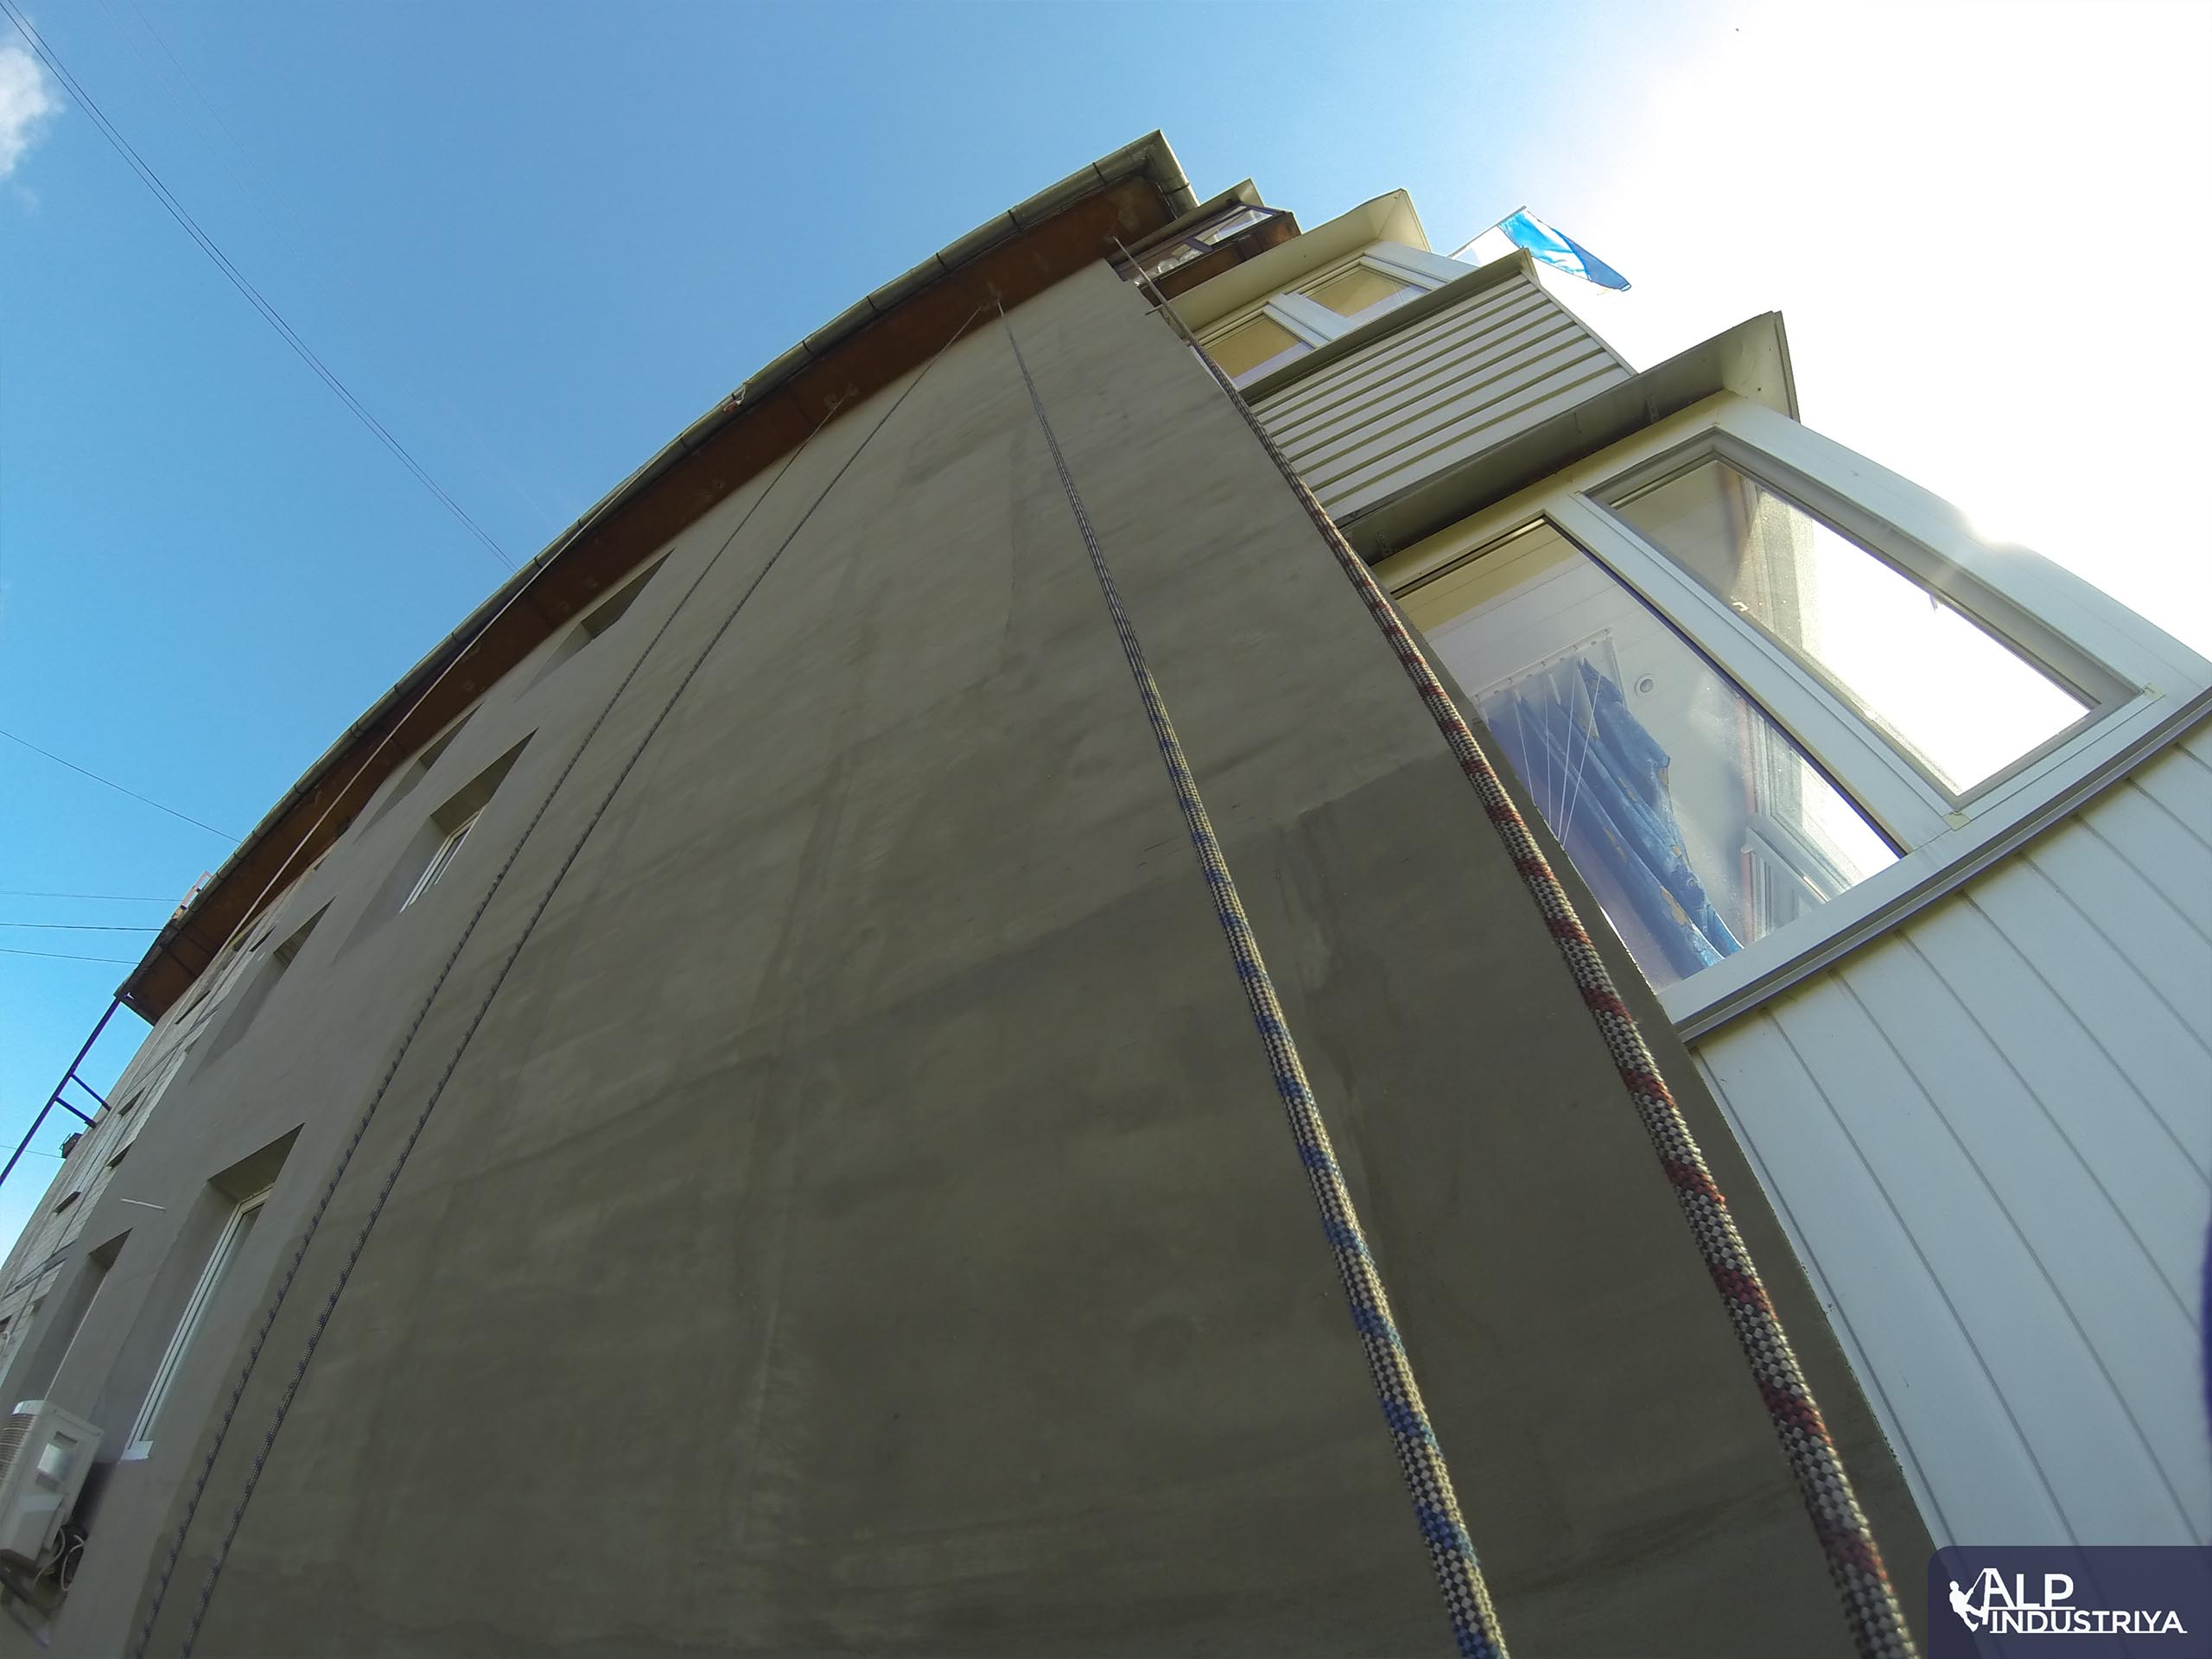 Теплоизоляция стен и углов многоквартирного дома промальпами-4